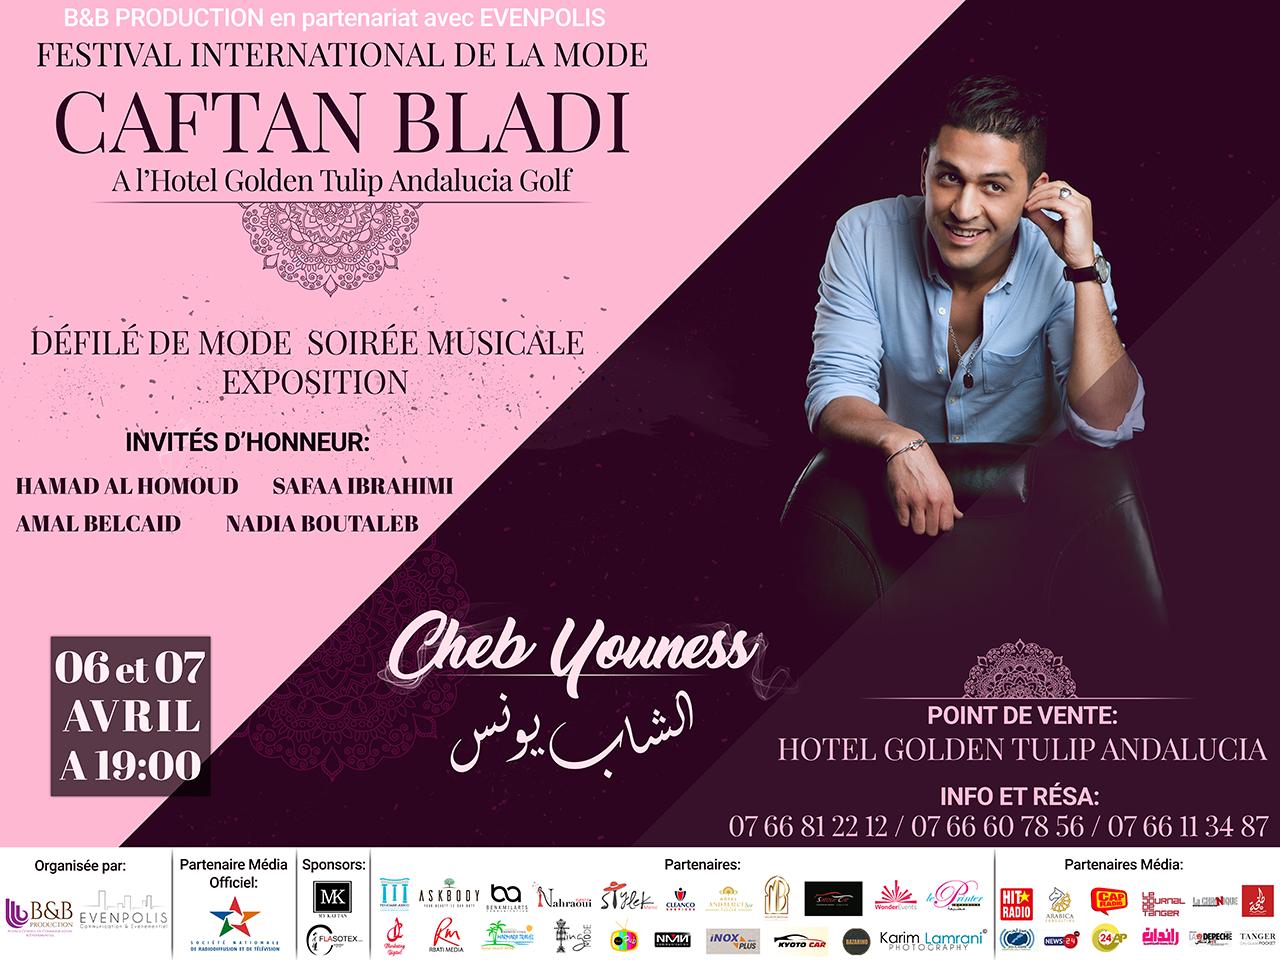 Design Panneau Caftan Bladi Cheb Youness 2018